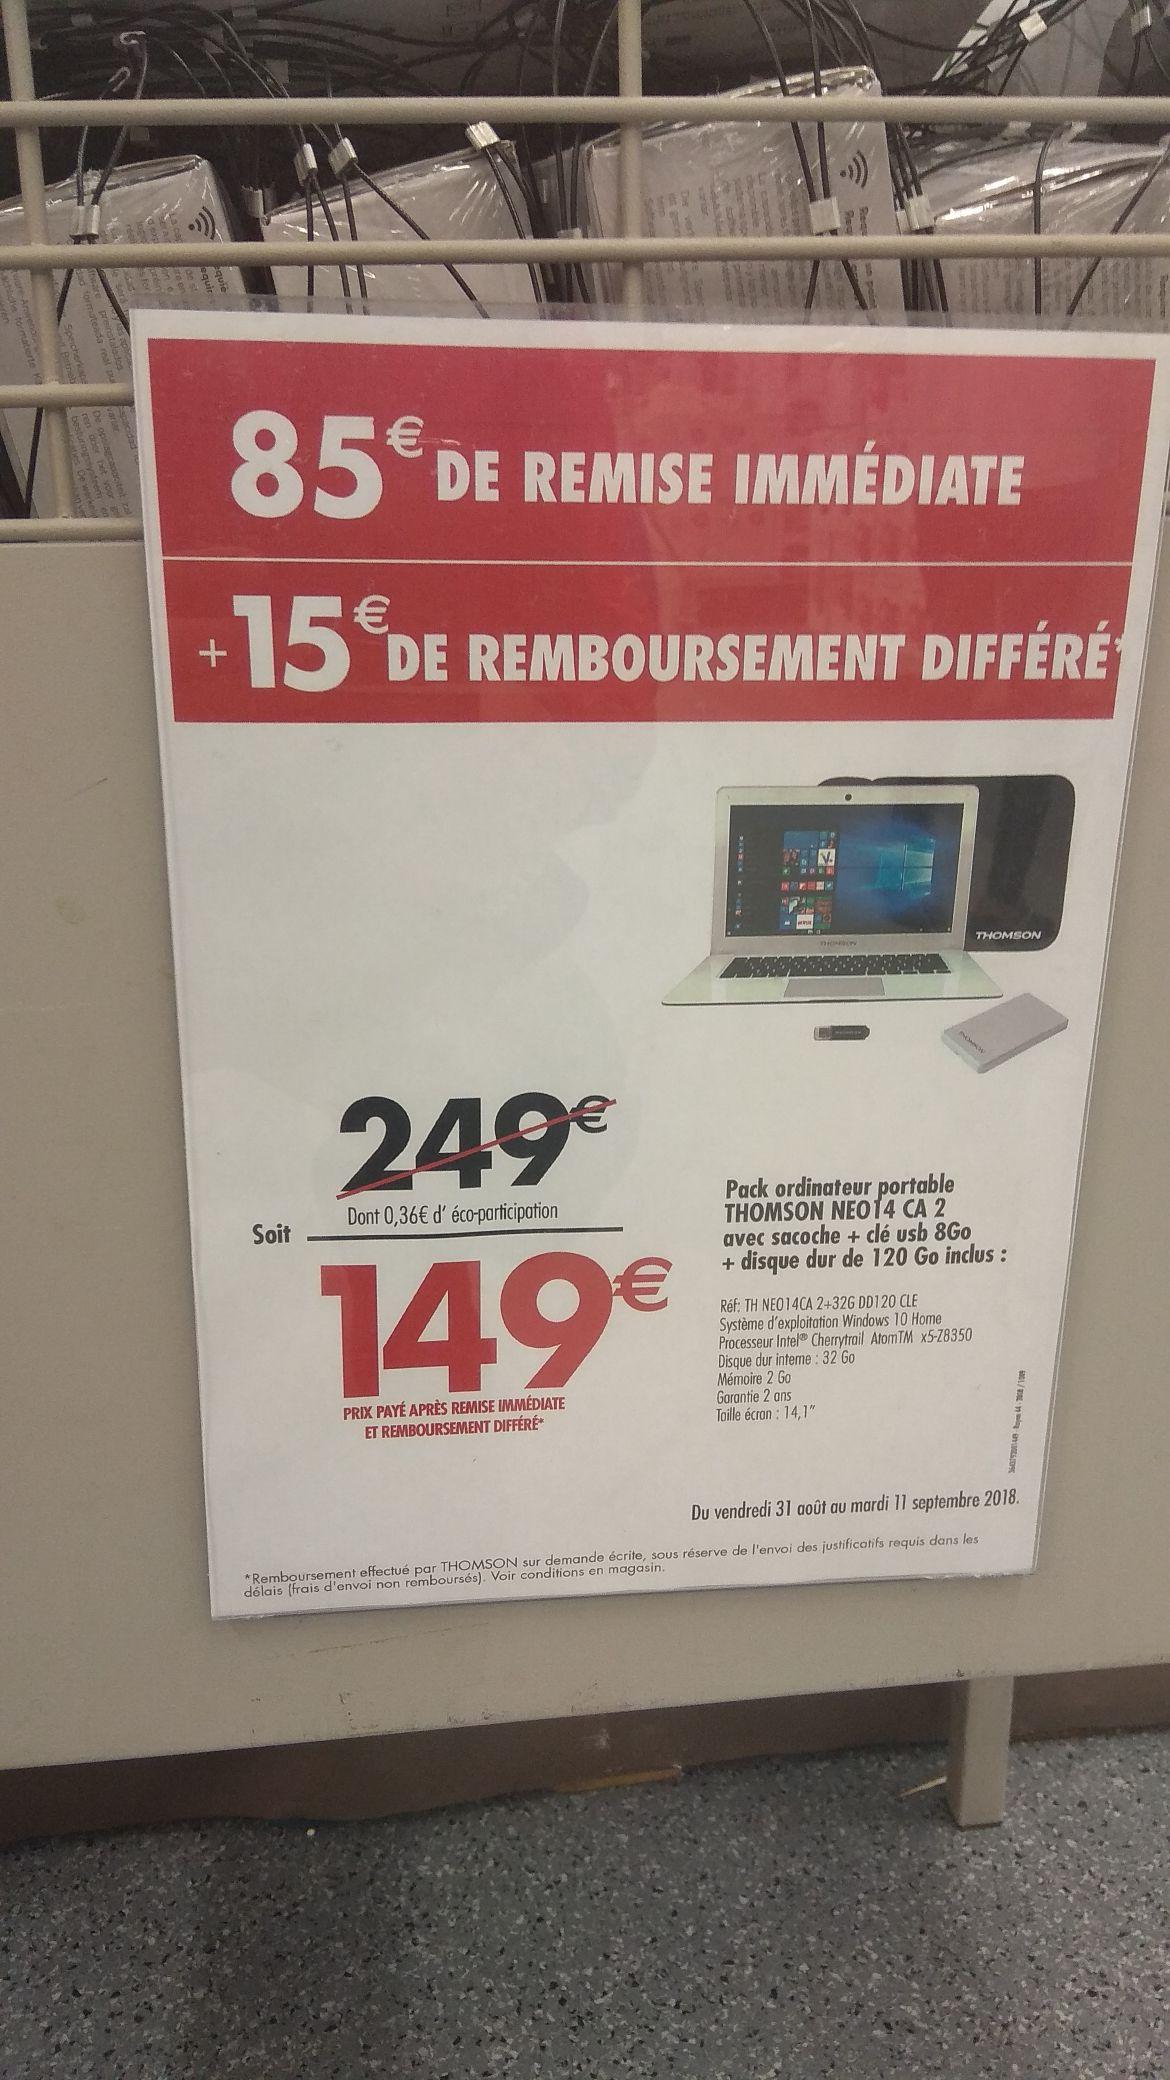 "PC Portable 14"" Thomson - Intel BayTrail Z3735F, RAM de 2Go, Stockage de 32Go + Disque Dur externe 120Go + Clé USB 8 Go + Saccoche (via ODR 15€)"